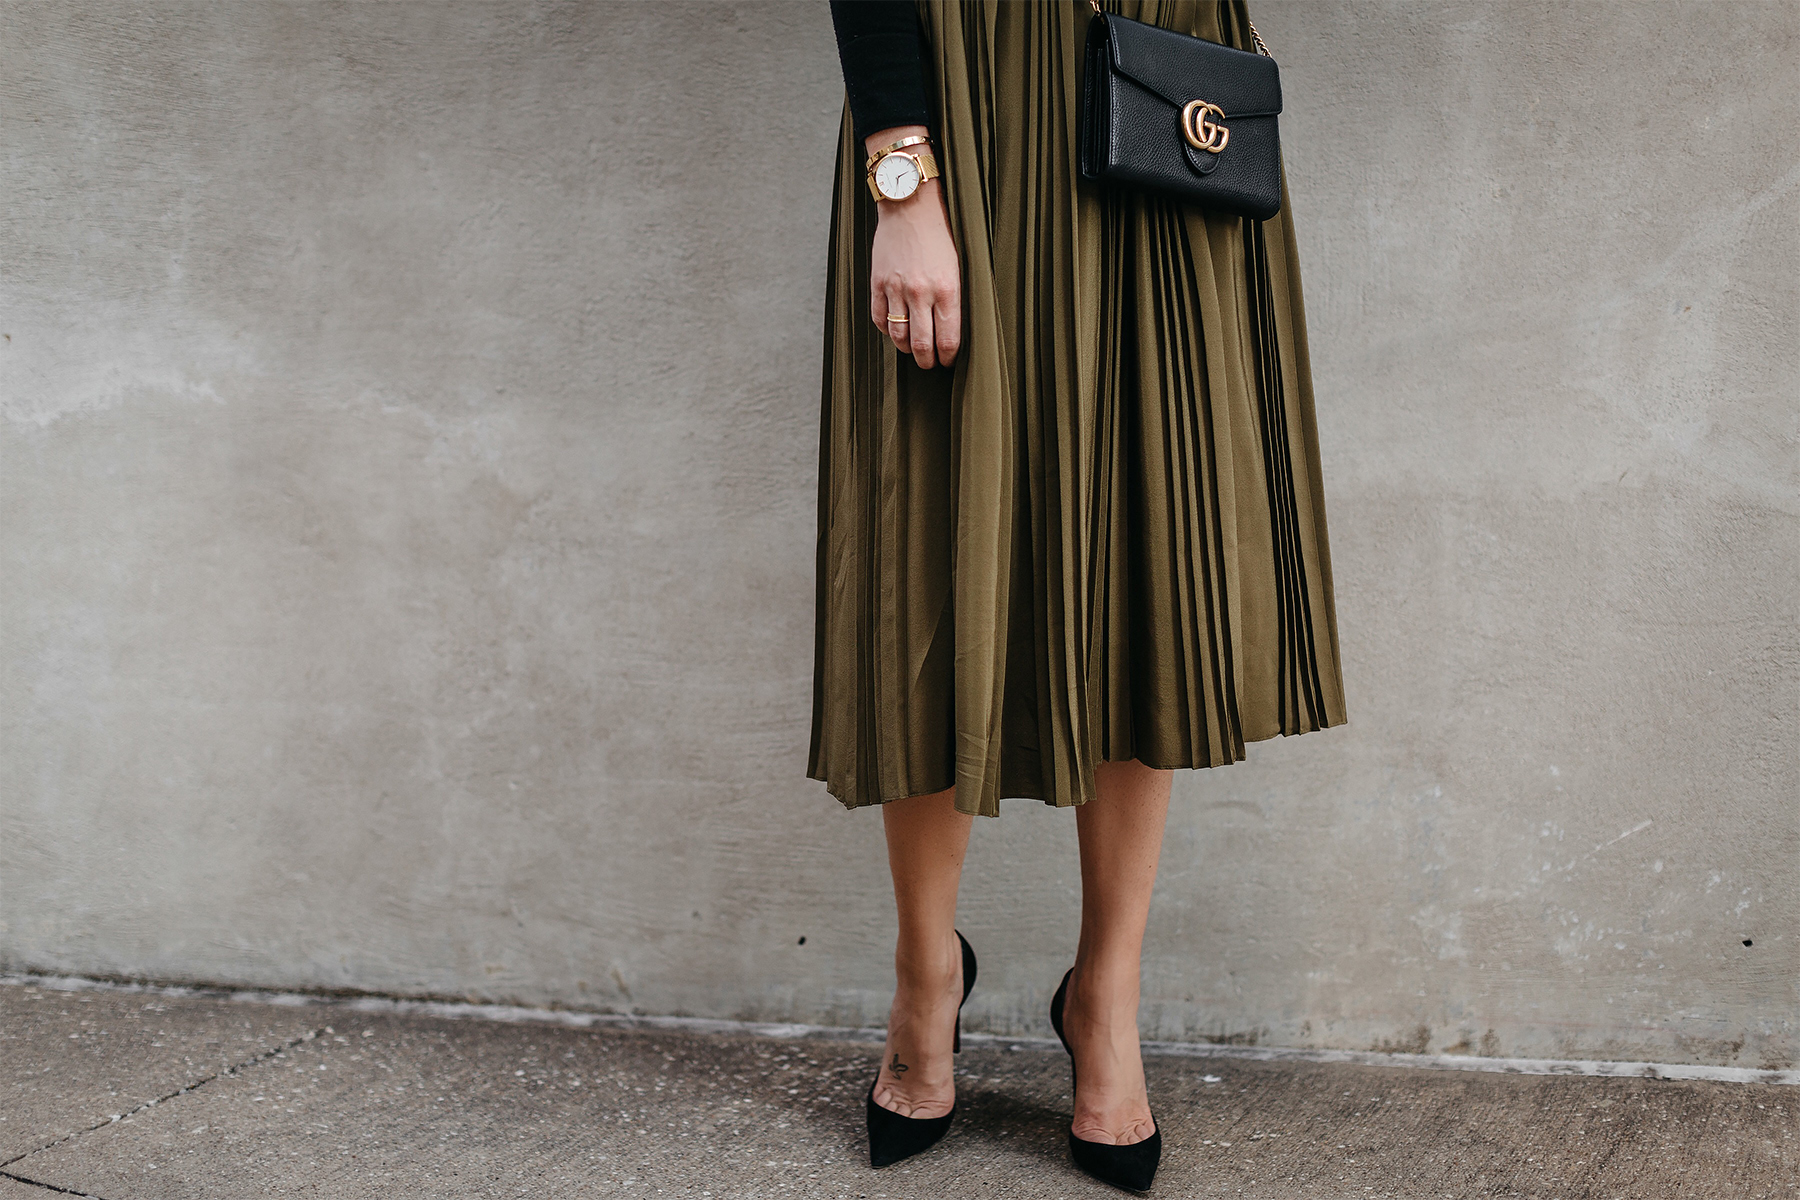 Robert Rodriguez Green Pleated Midi Skirt Gucci Marmont Handbag Christian Louboutin Black Pumps Fashion Jackson Dallas Blogger Fashion Blogger Street Style